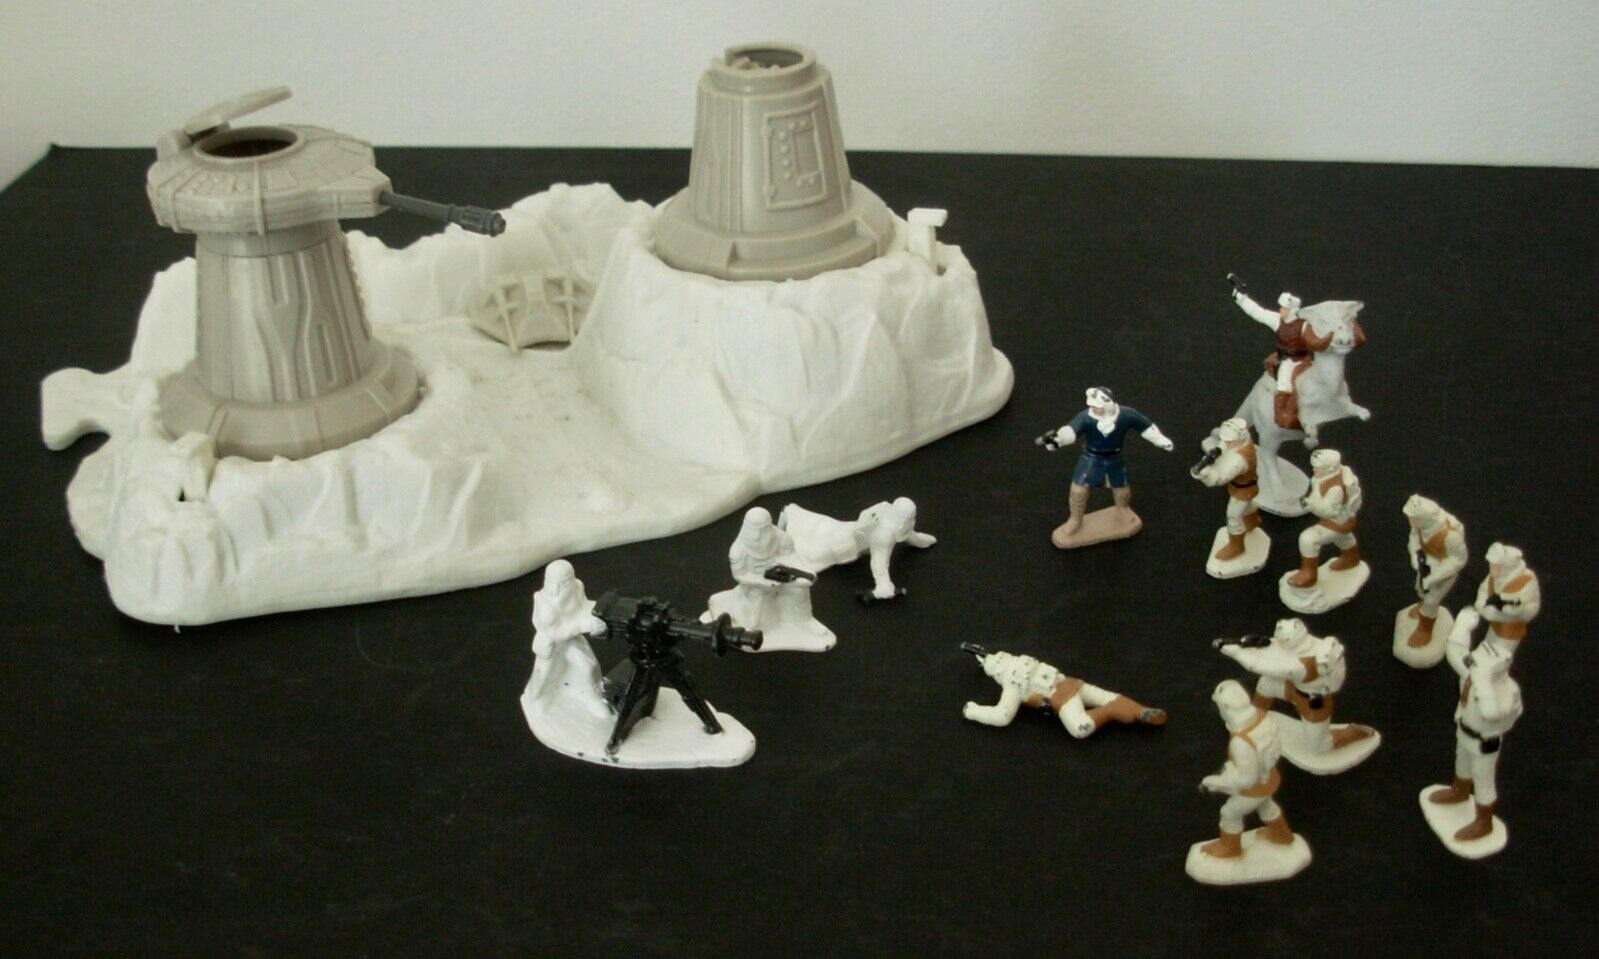 Star Wars planète Hoth 1982,1 Section & 13 mini figures, y compris Han Solo